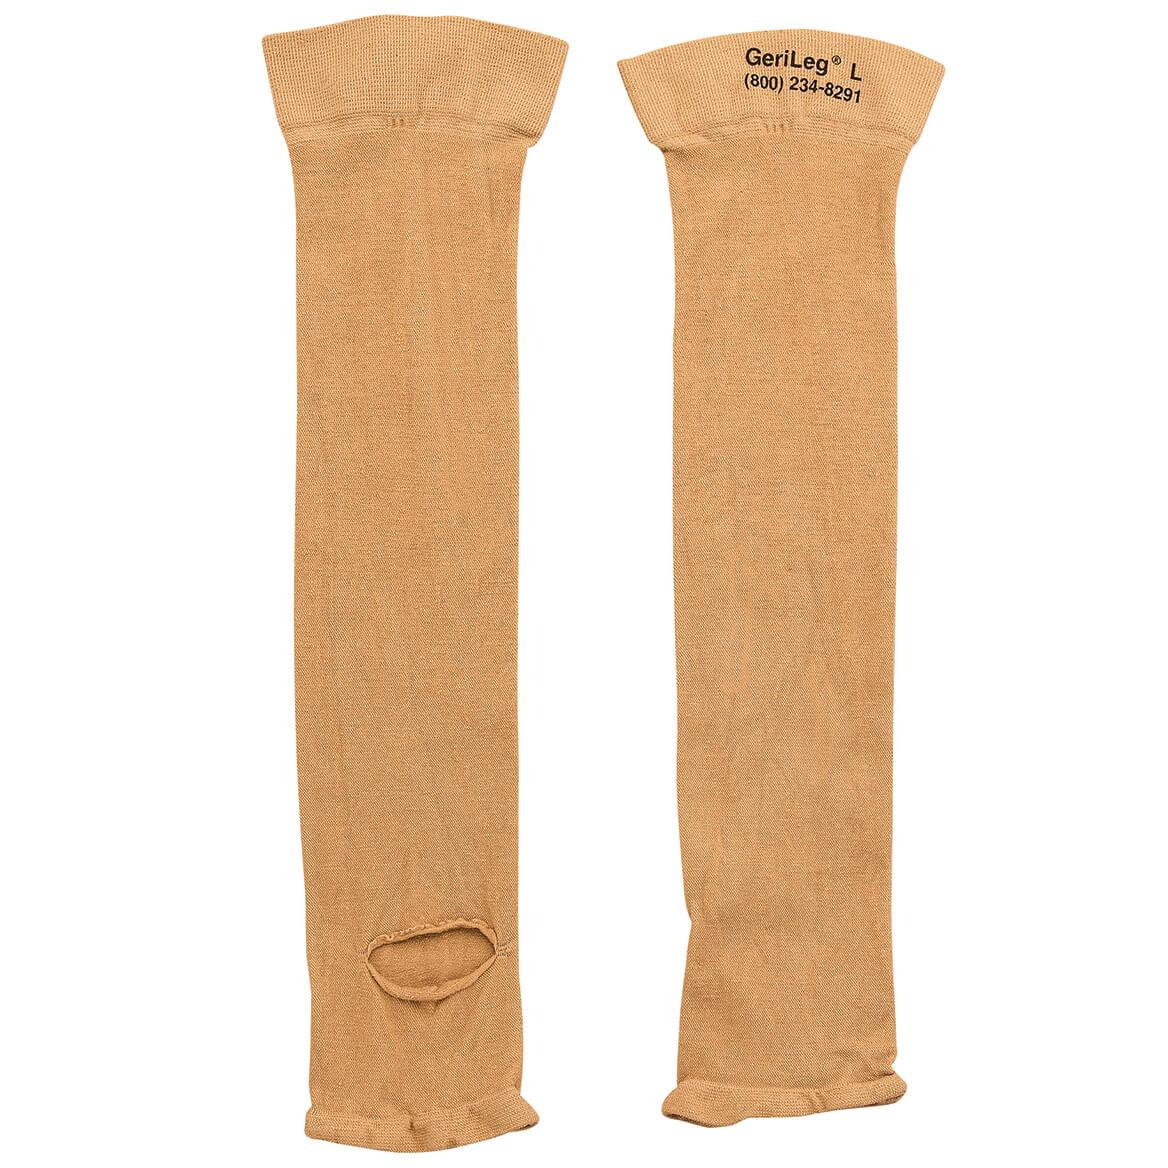 GeriLeg® The Original Leg Protector for Thin Skin-371591